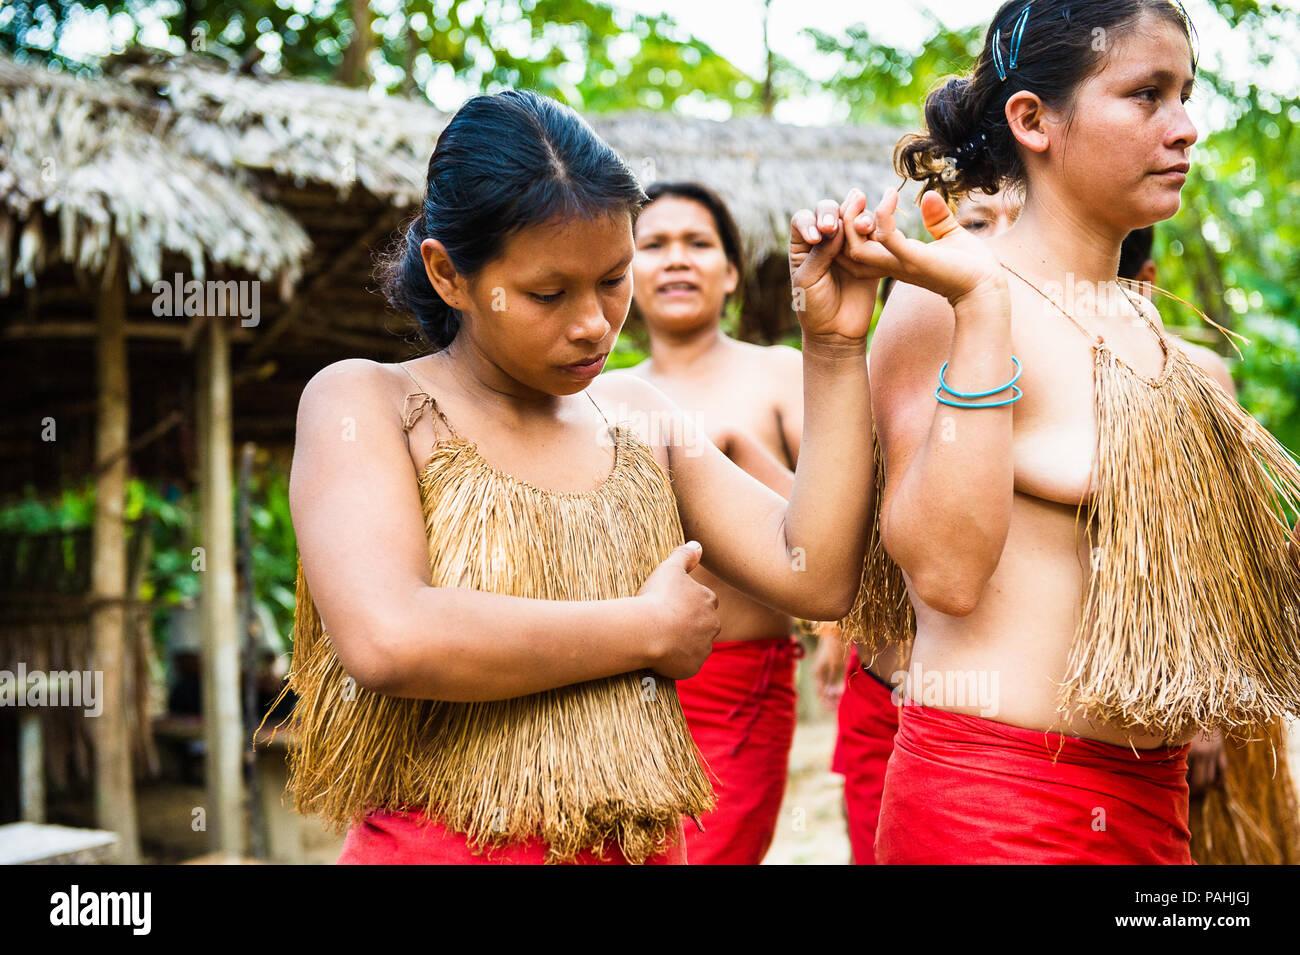 amazonia peru nov 10 2010 unidentified amazonian indigenous